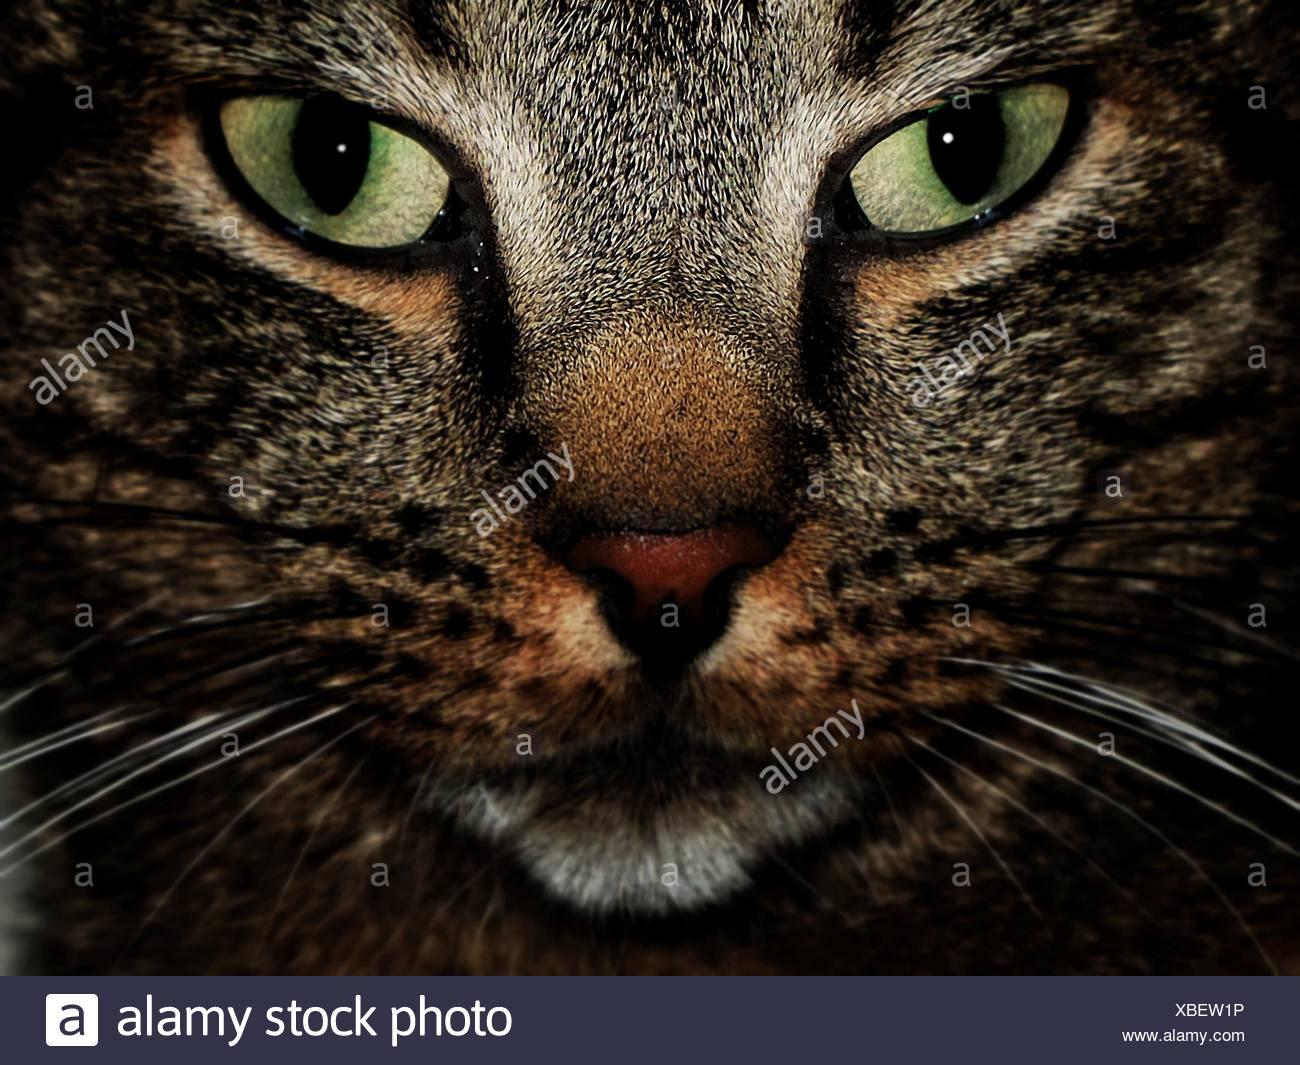 Portrait Of Cat - Stock Image